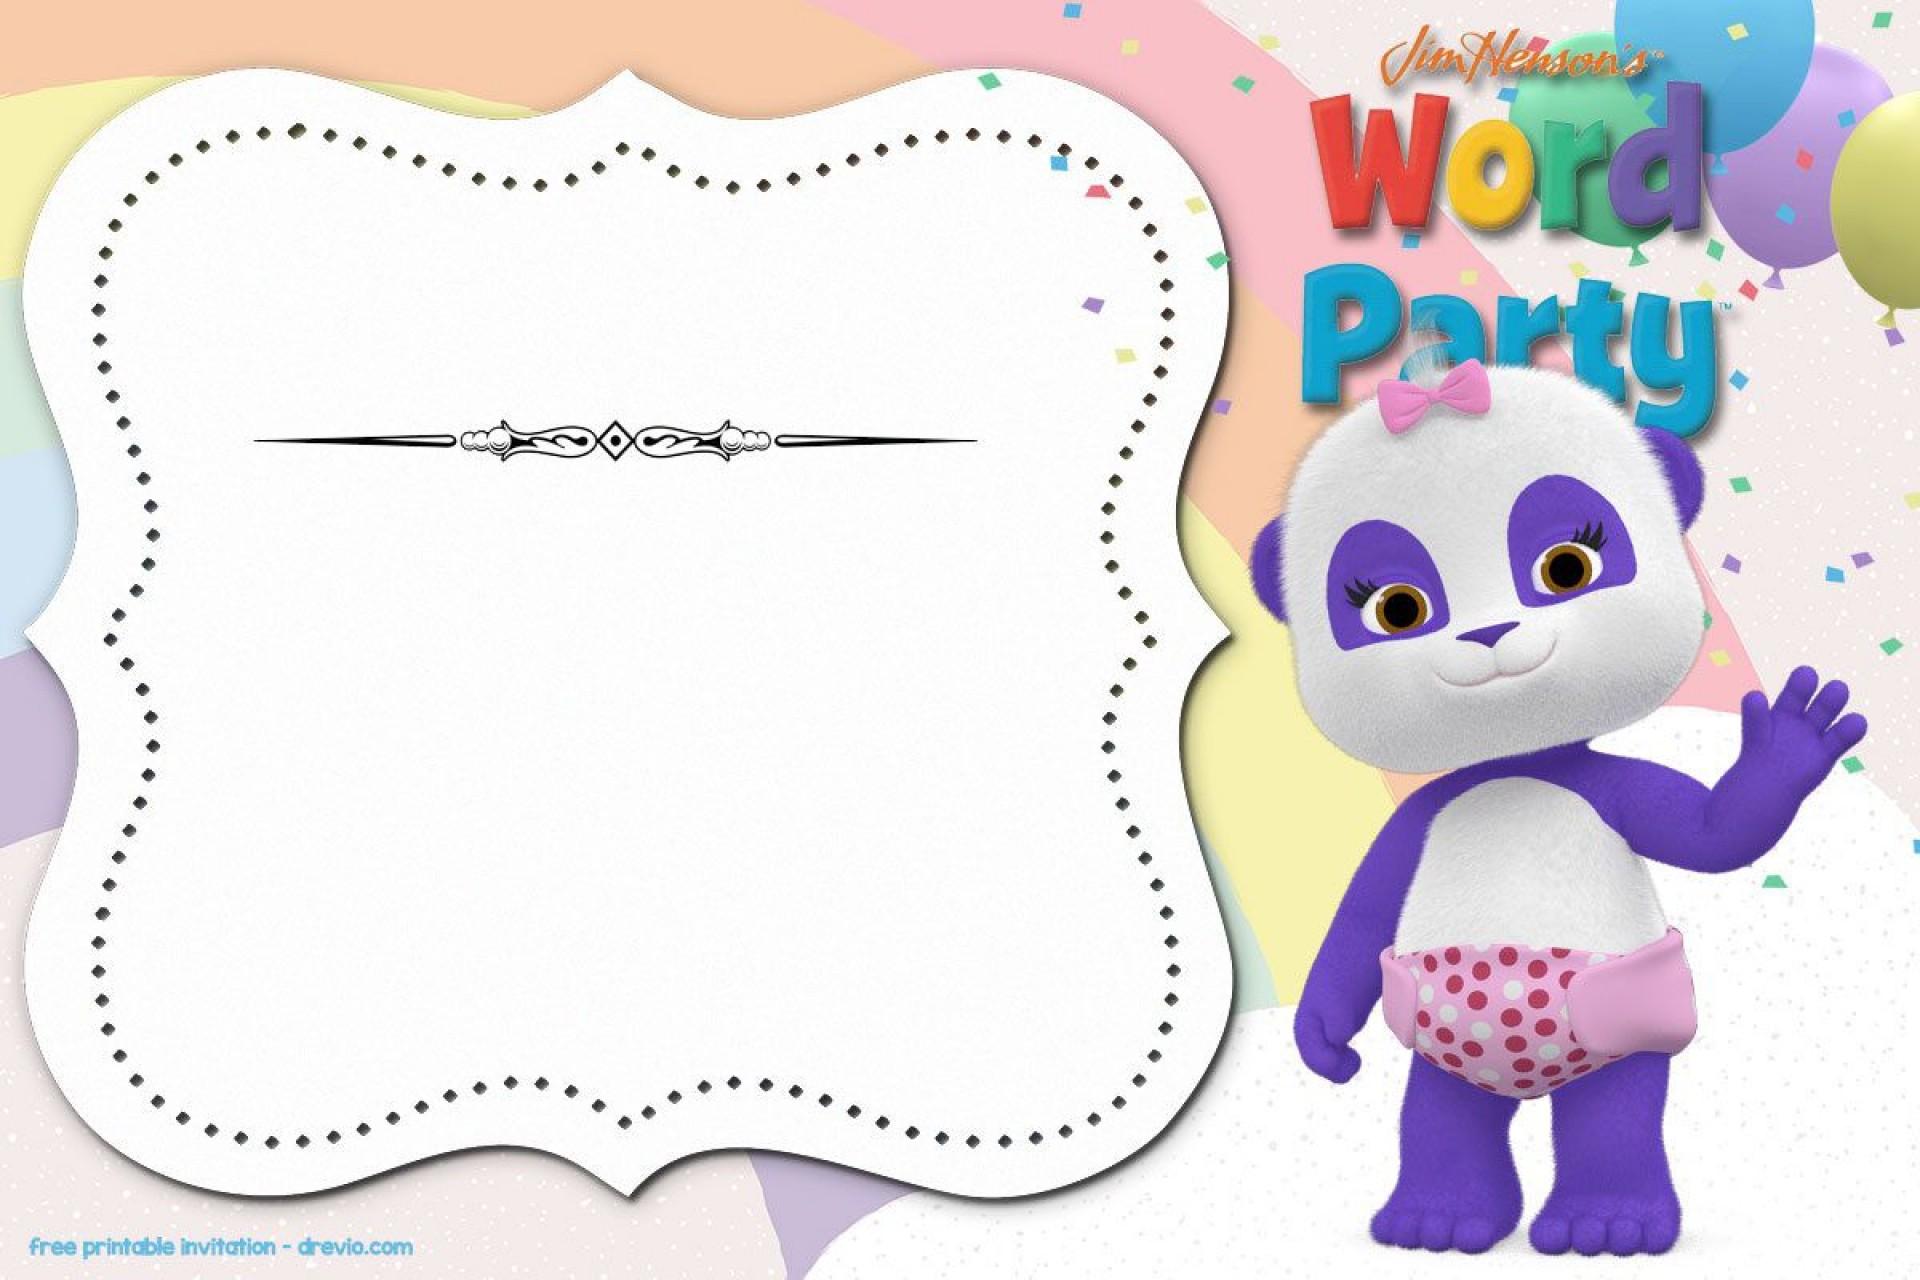 009 Sensational Birthday Invite Template Word Free Idea  Party Invitation1920